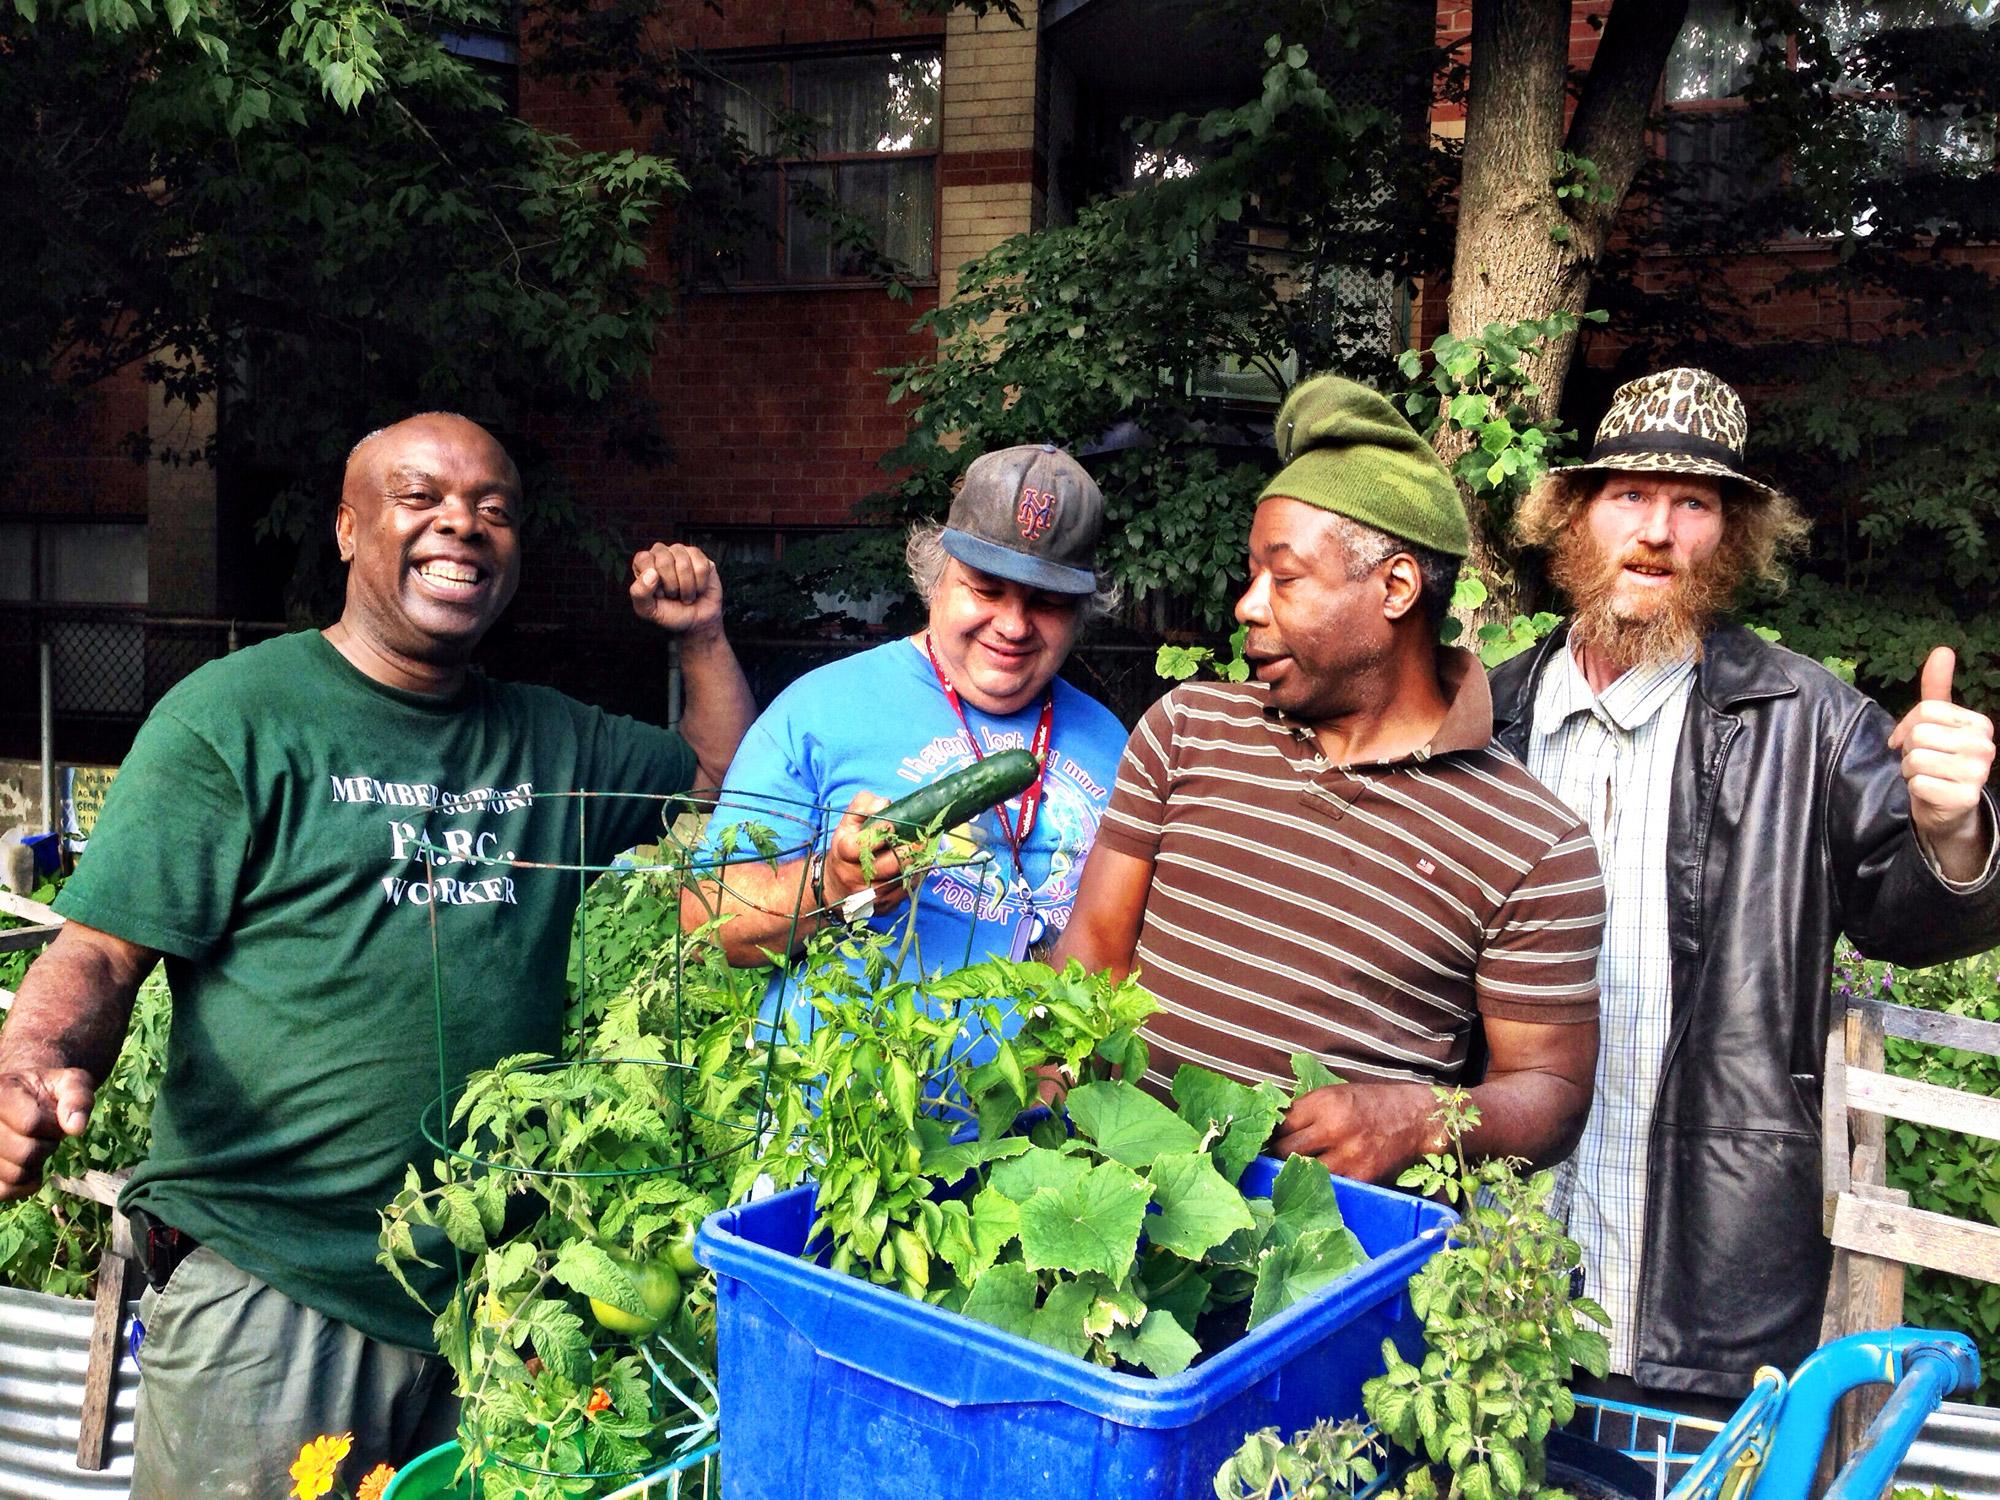 Eugene, Robbie, Glenmore, and James celebrate the harvest.